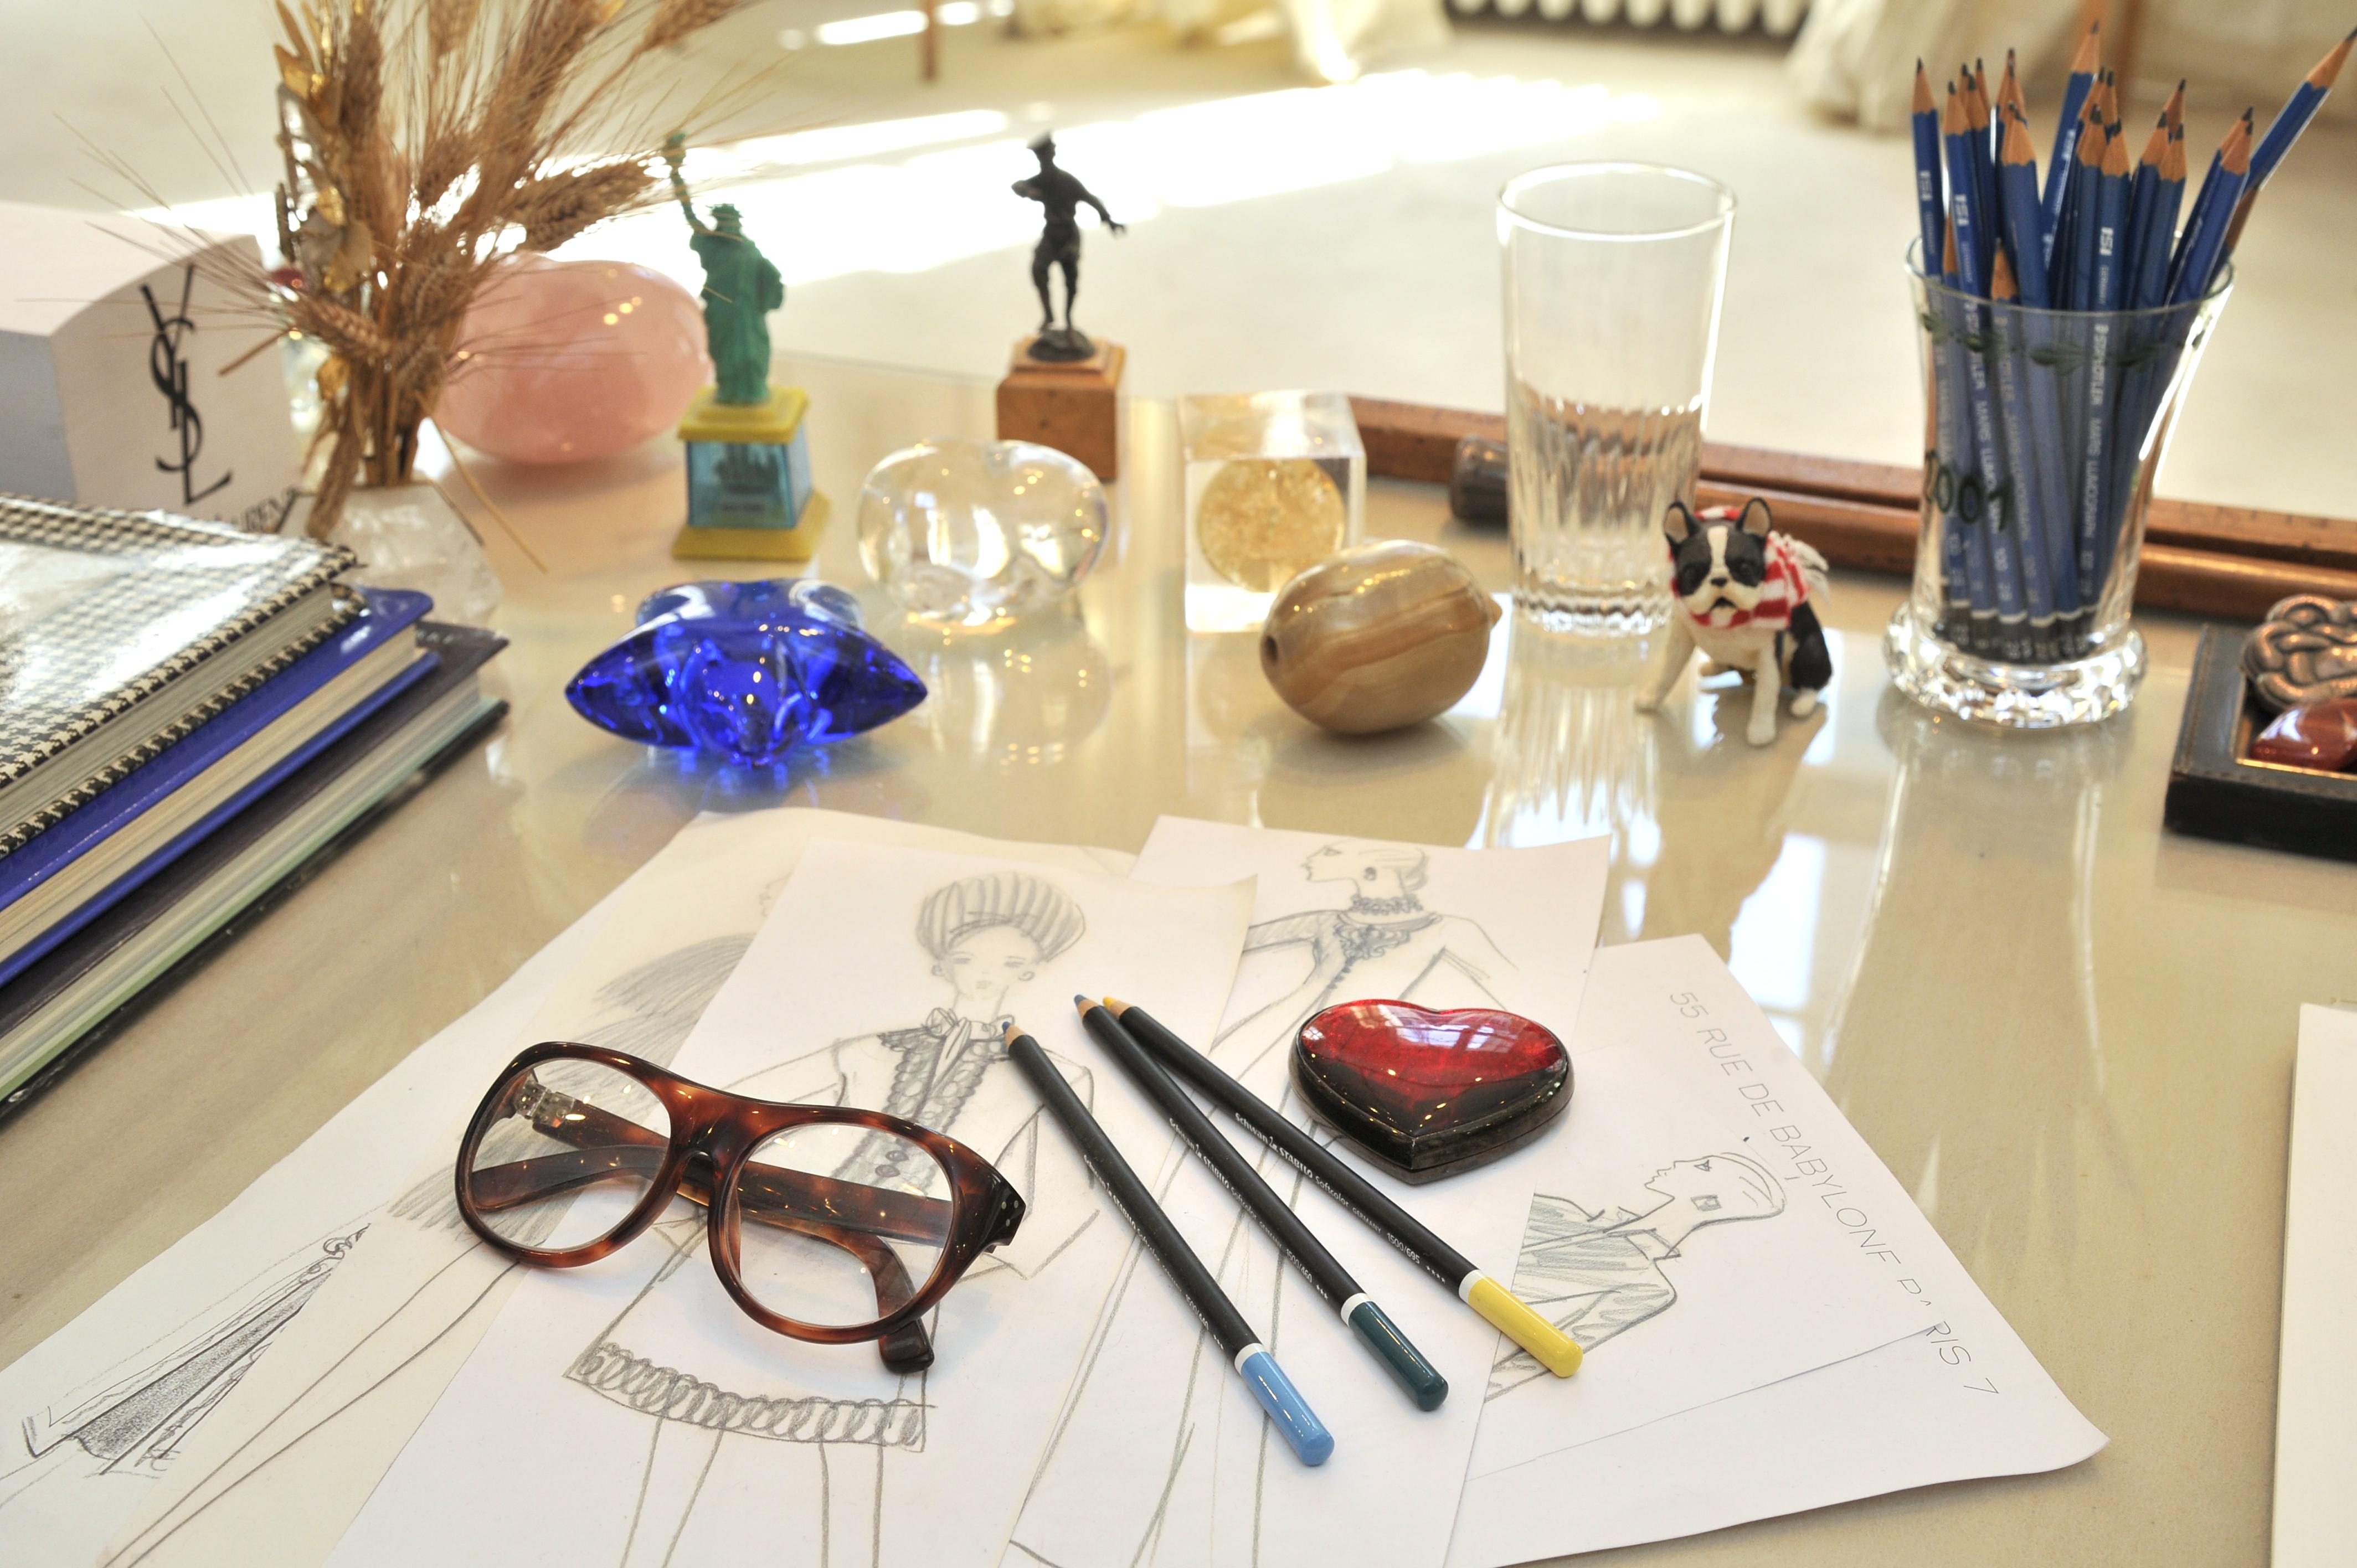 Items from Yves Saint Laurent's studio.